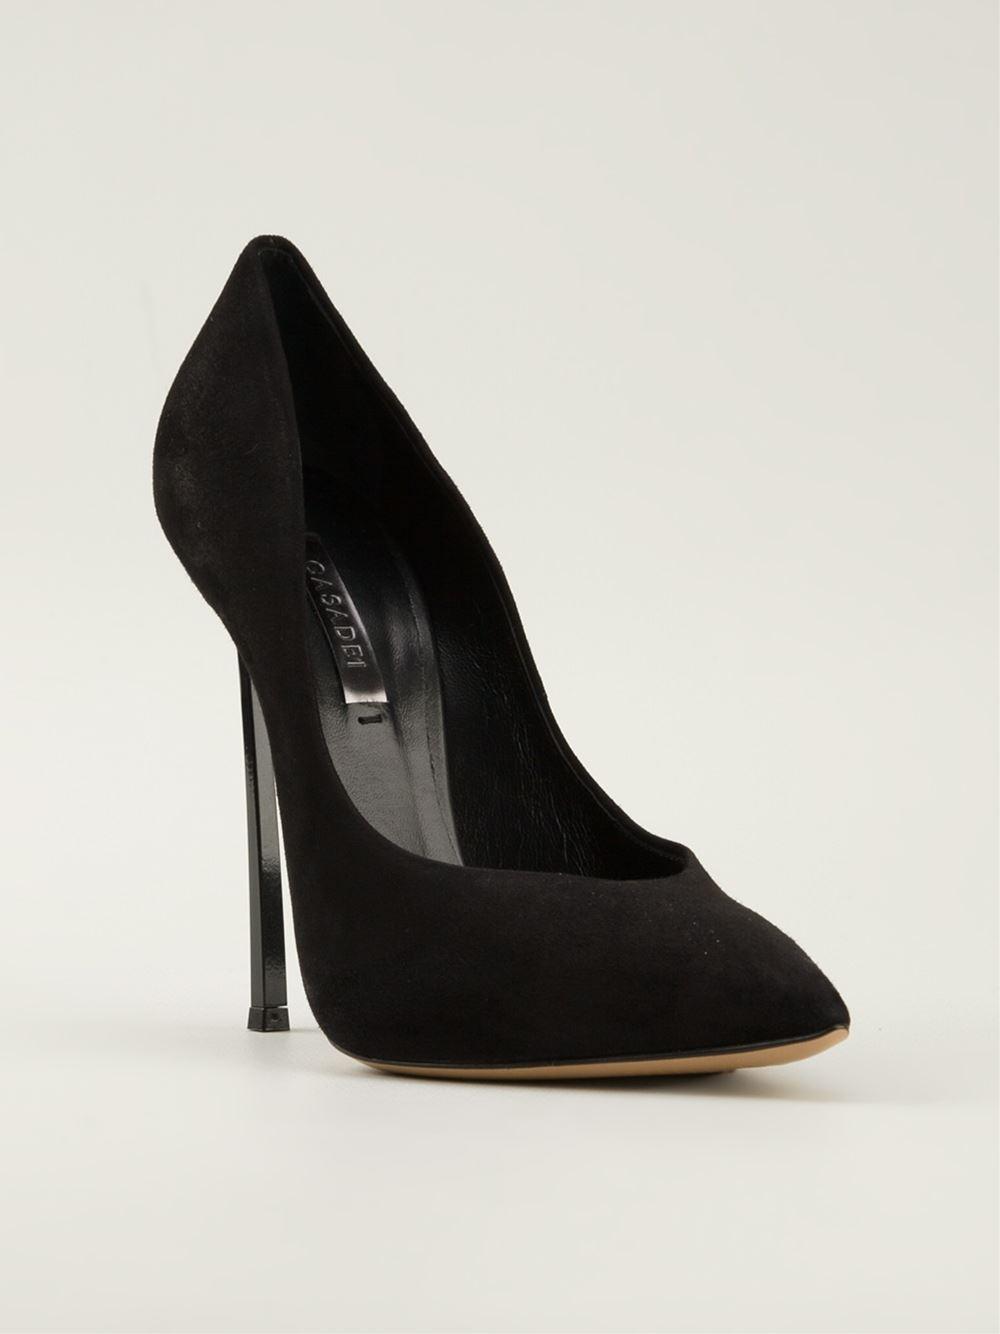 Casadei Stiletto Pump - Biondini Paris - Farfetch.com